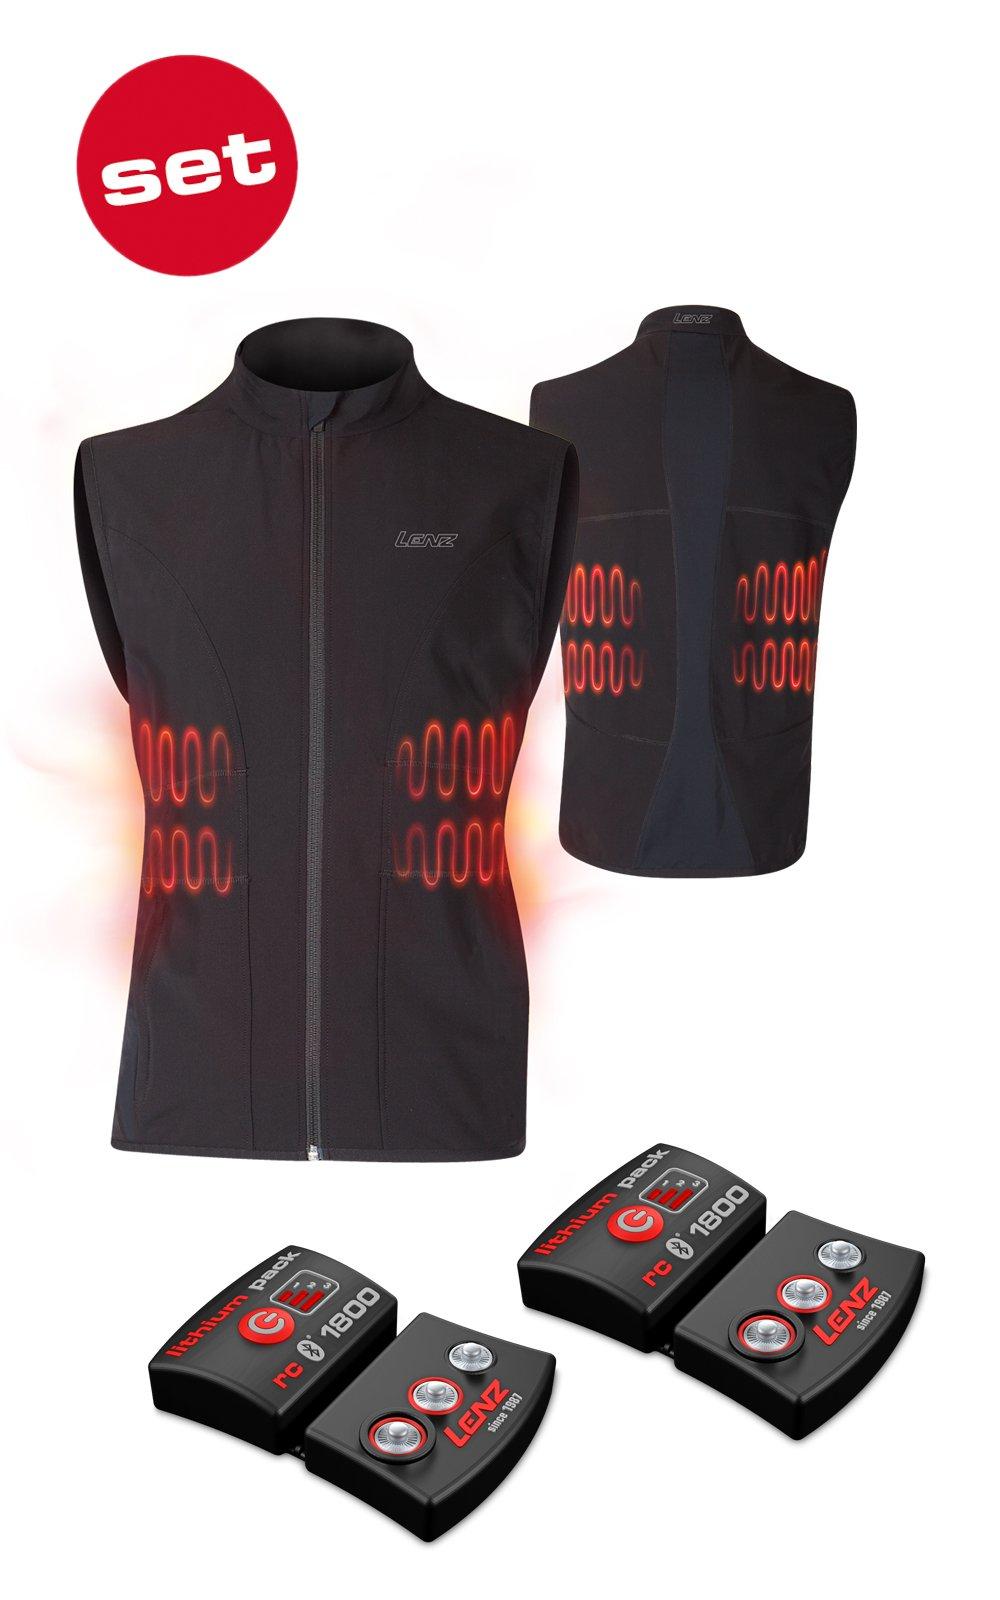 SET - Vyhrievaná vesta LENZ Heat Vest 1.0 Men + batérie lithium pack rcB 1800